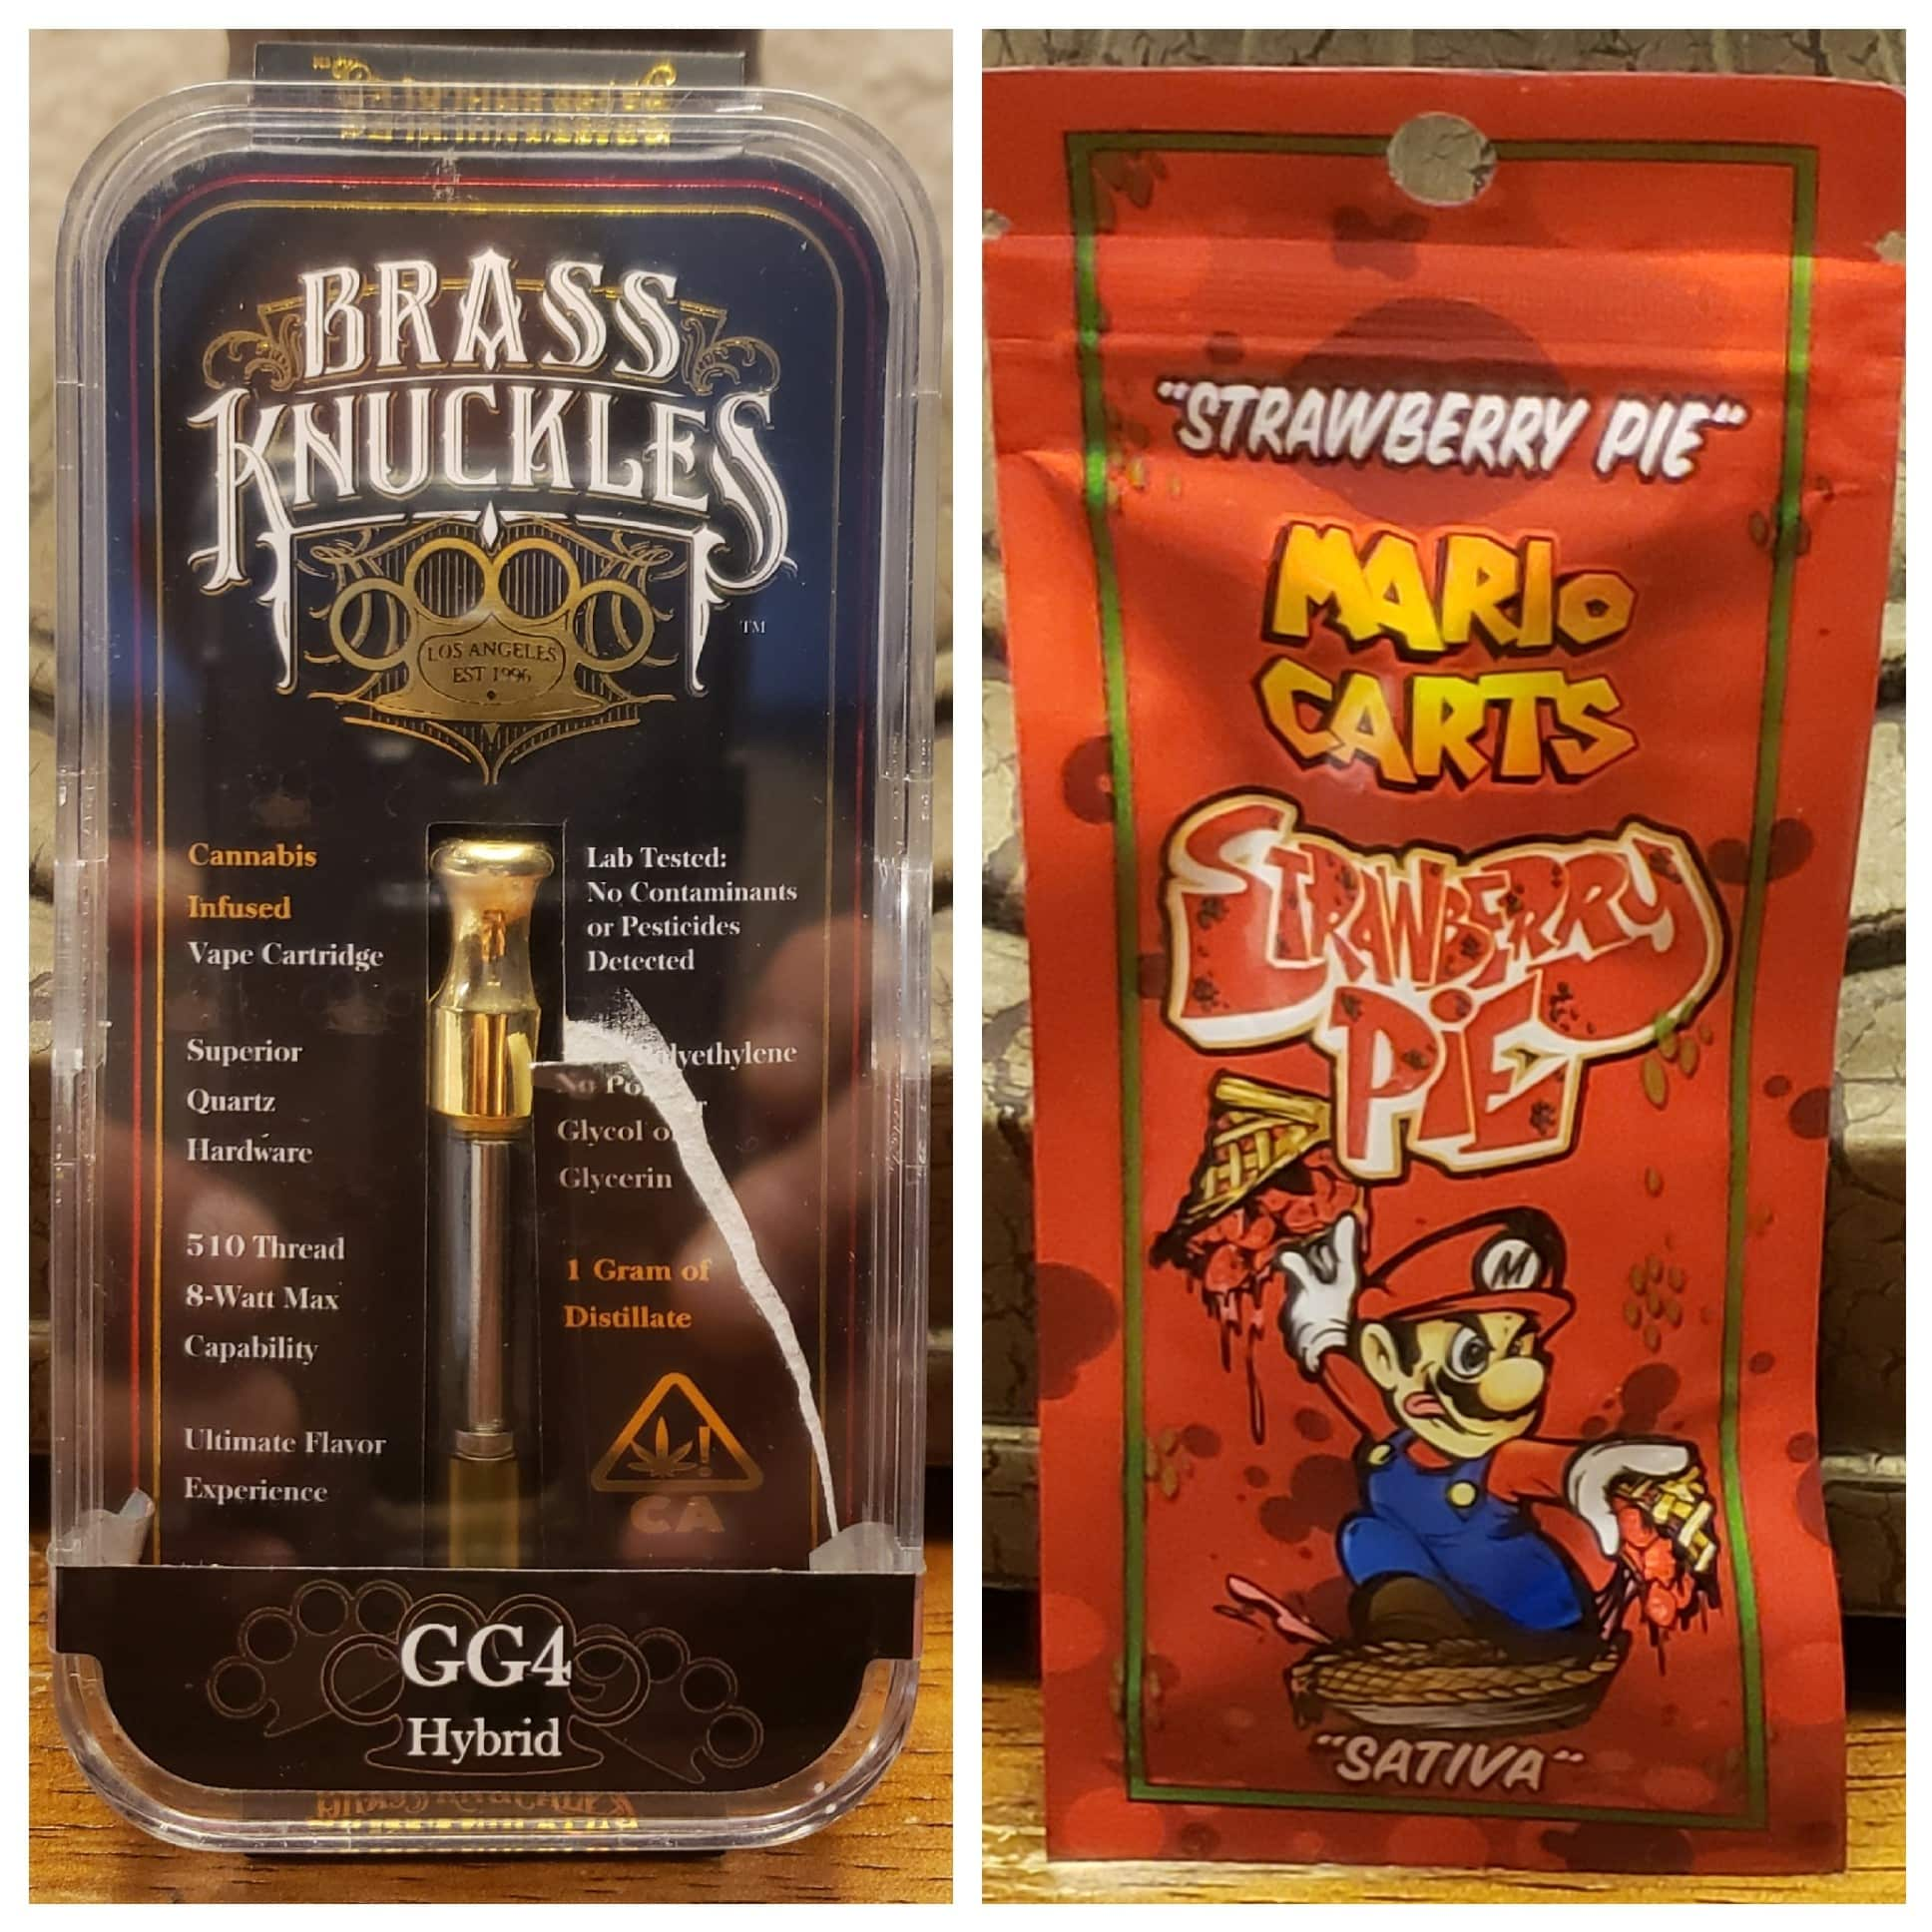 Brass Knuckles vs Mario Carts